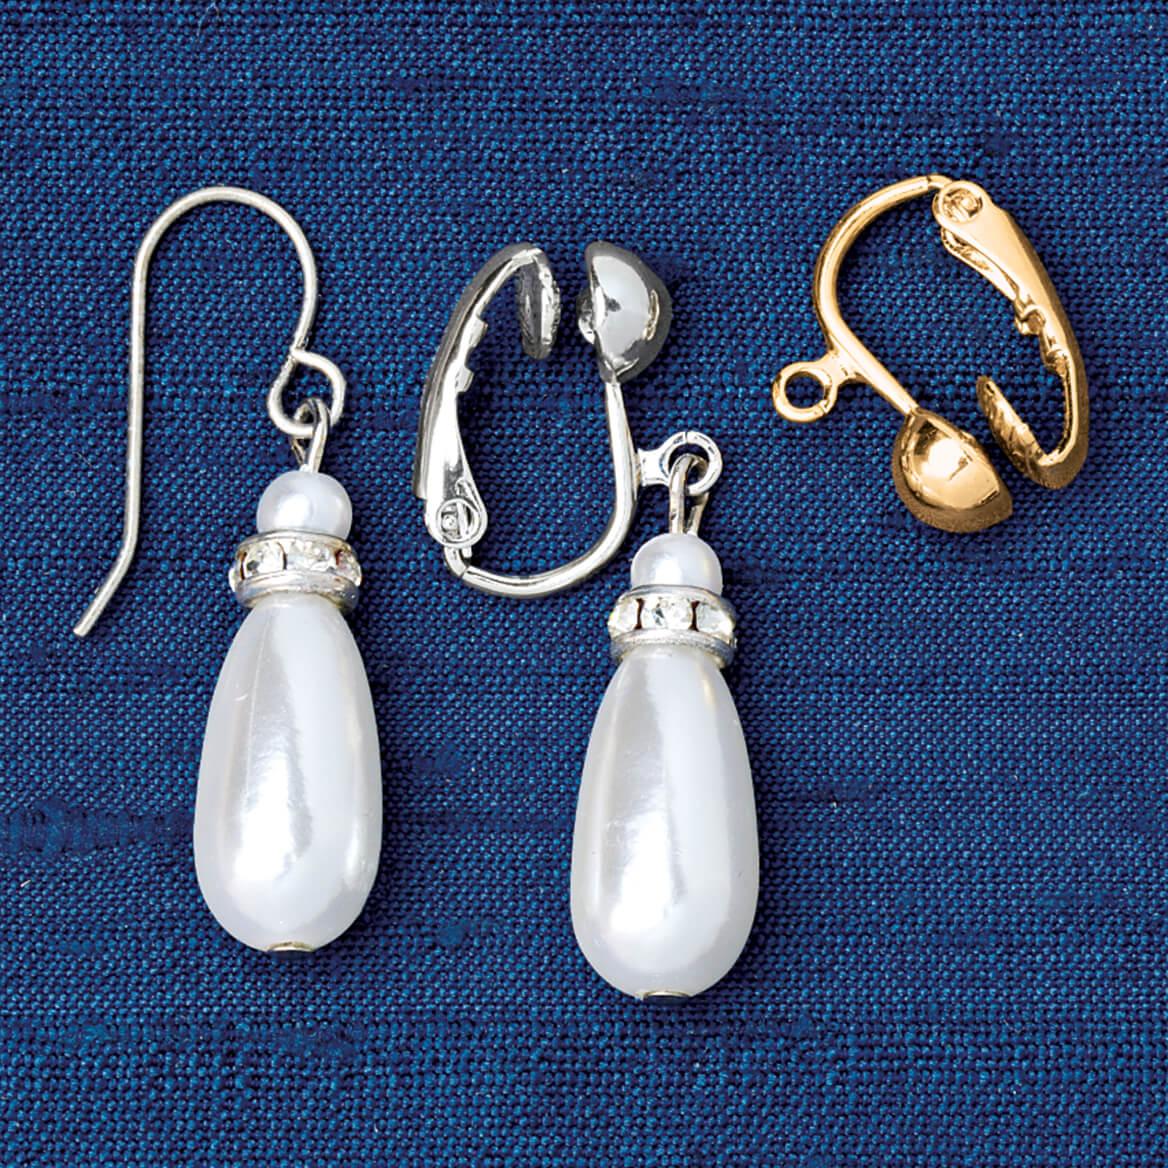 Fish Hook Earring Converter Earring Converters Miles Kimball